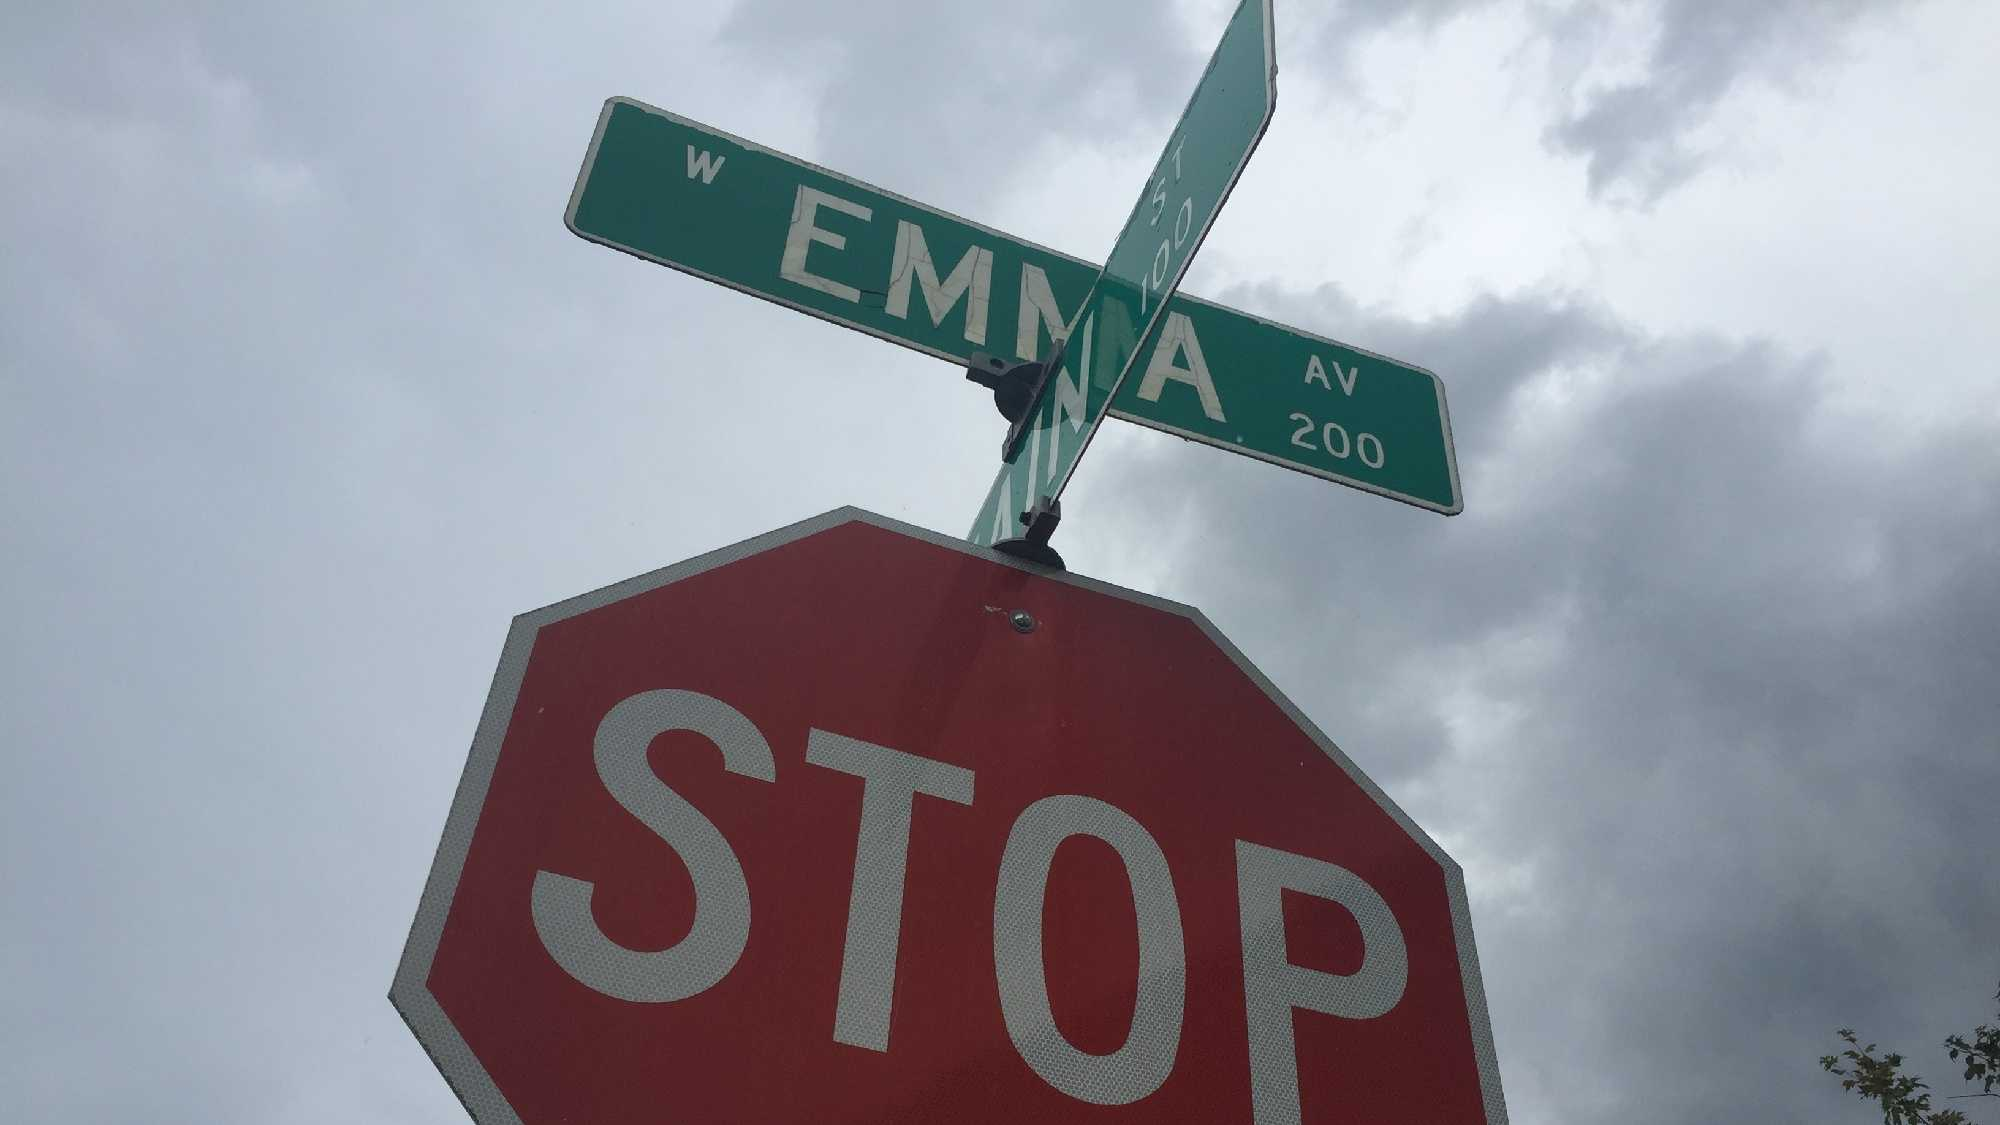 emma avenue.jpg